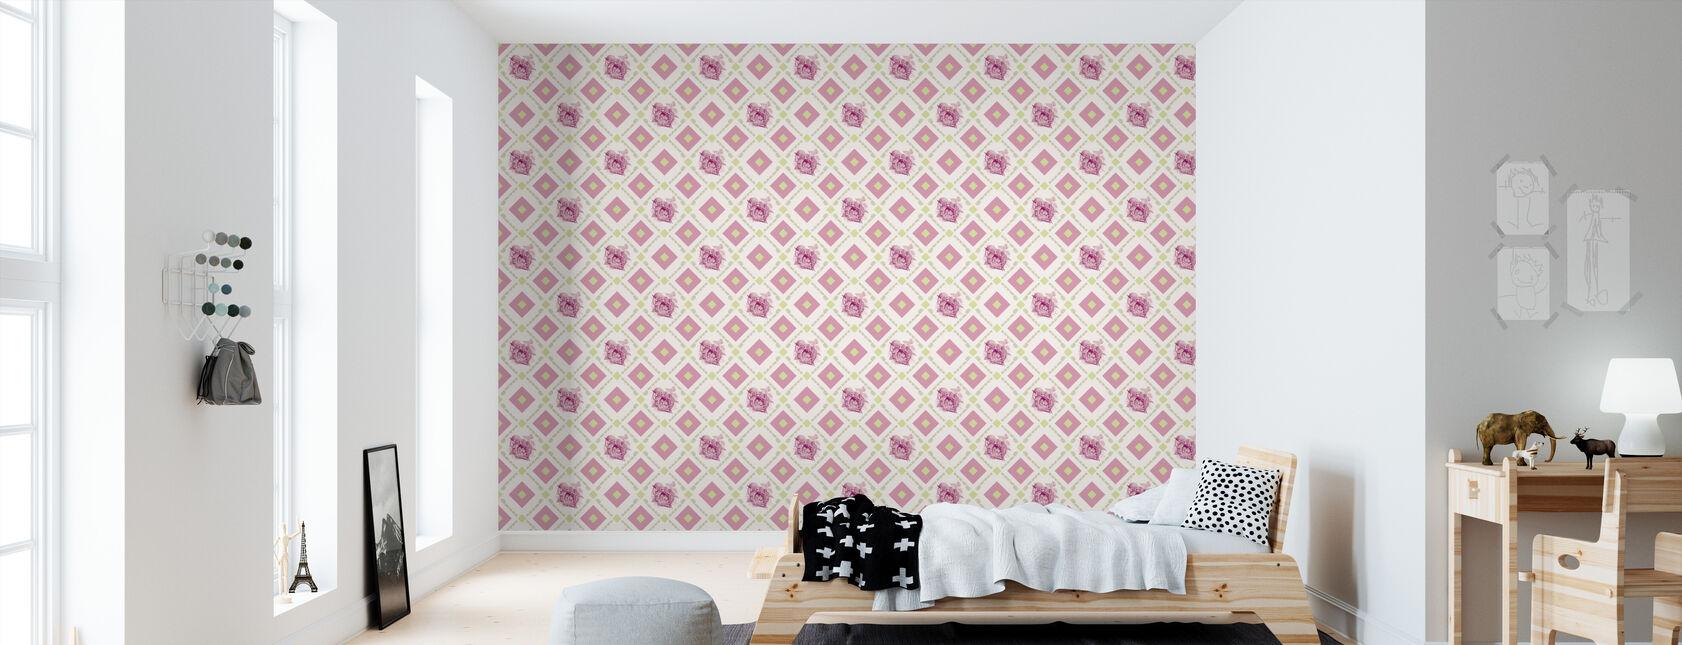 Dormouse - hedgehogframe - Pink Green - Wallpaper - Kids Room